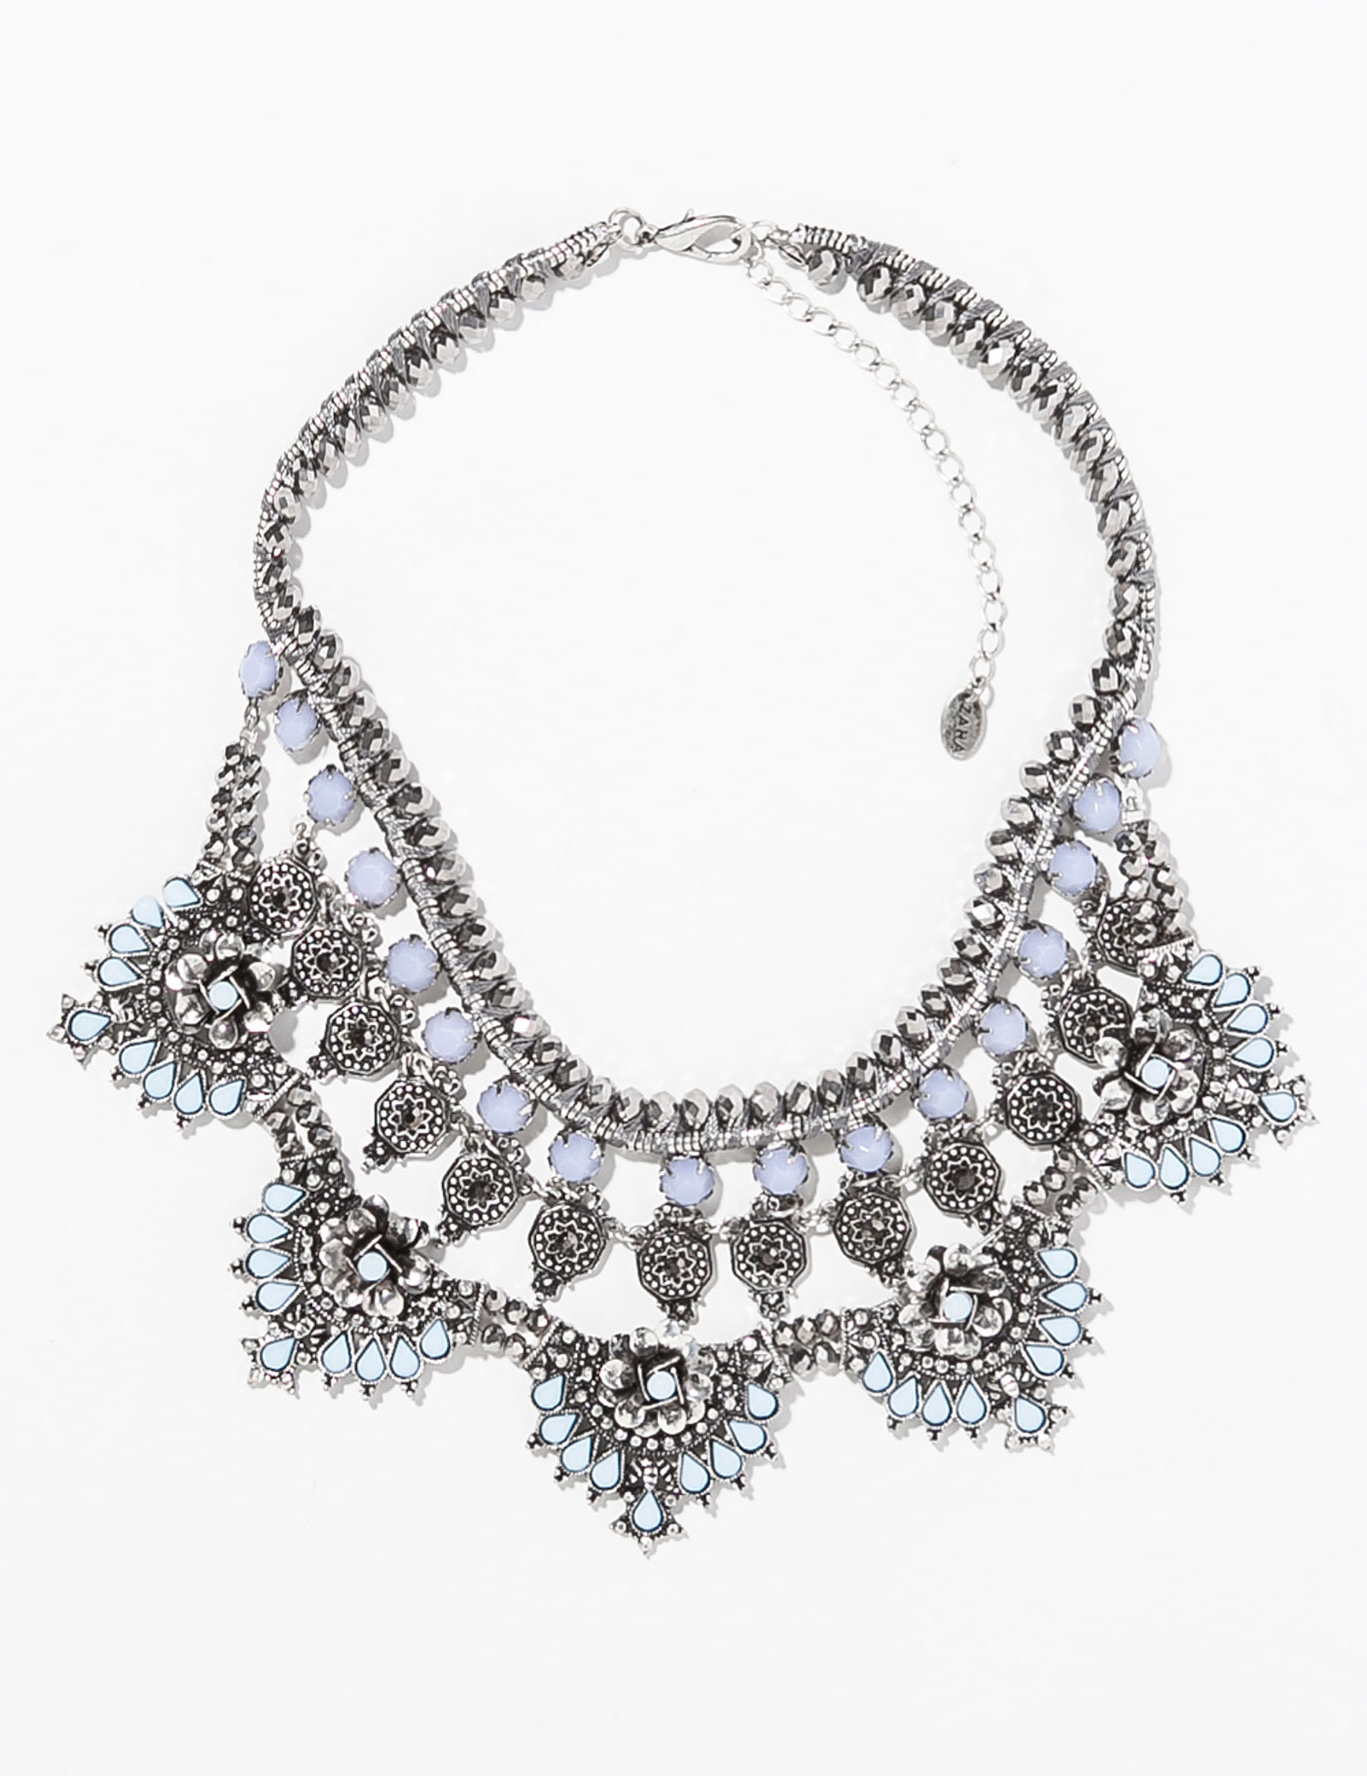 Zara silver and moonstone bib necklace ($40)